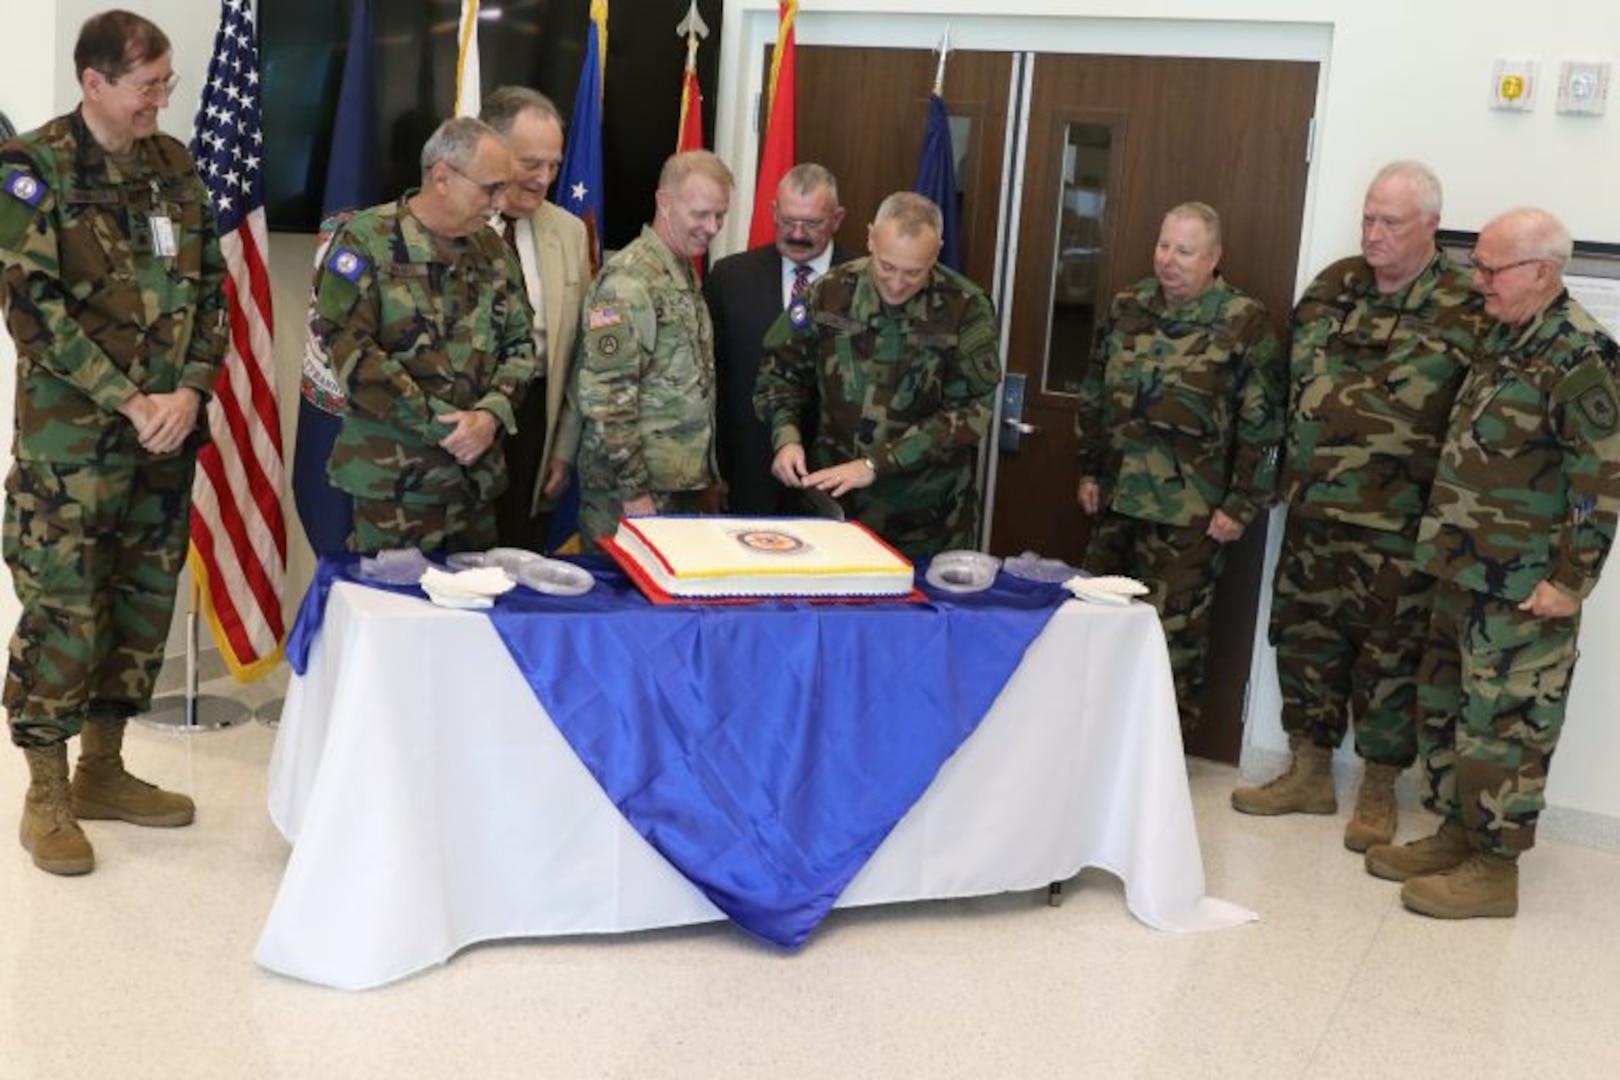 Virginia Defense Force celebrates 35th anniversary